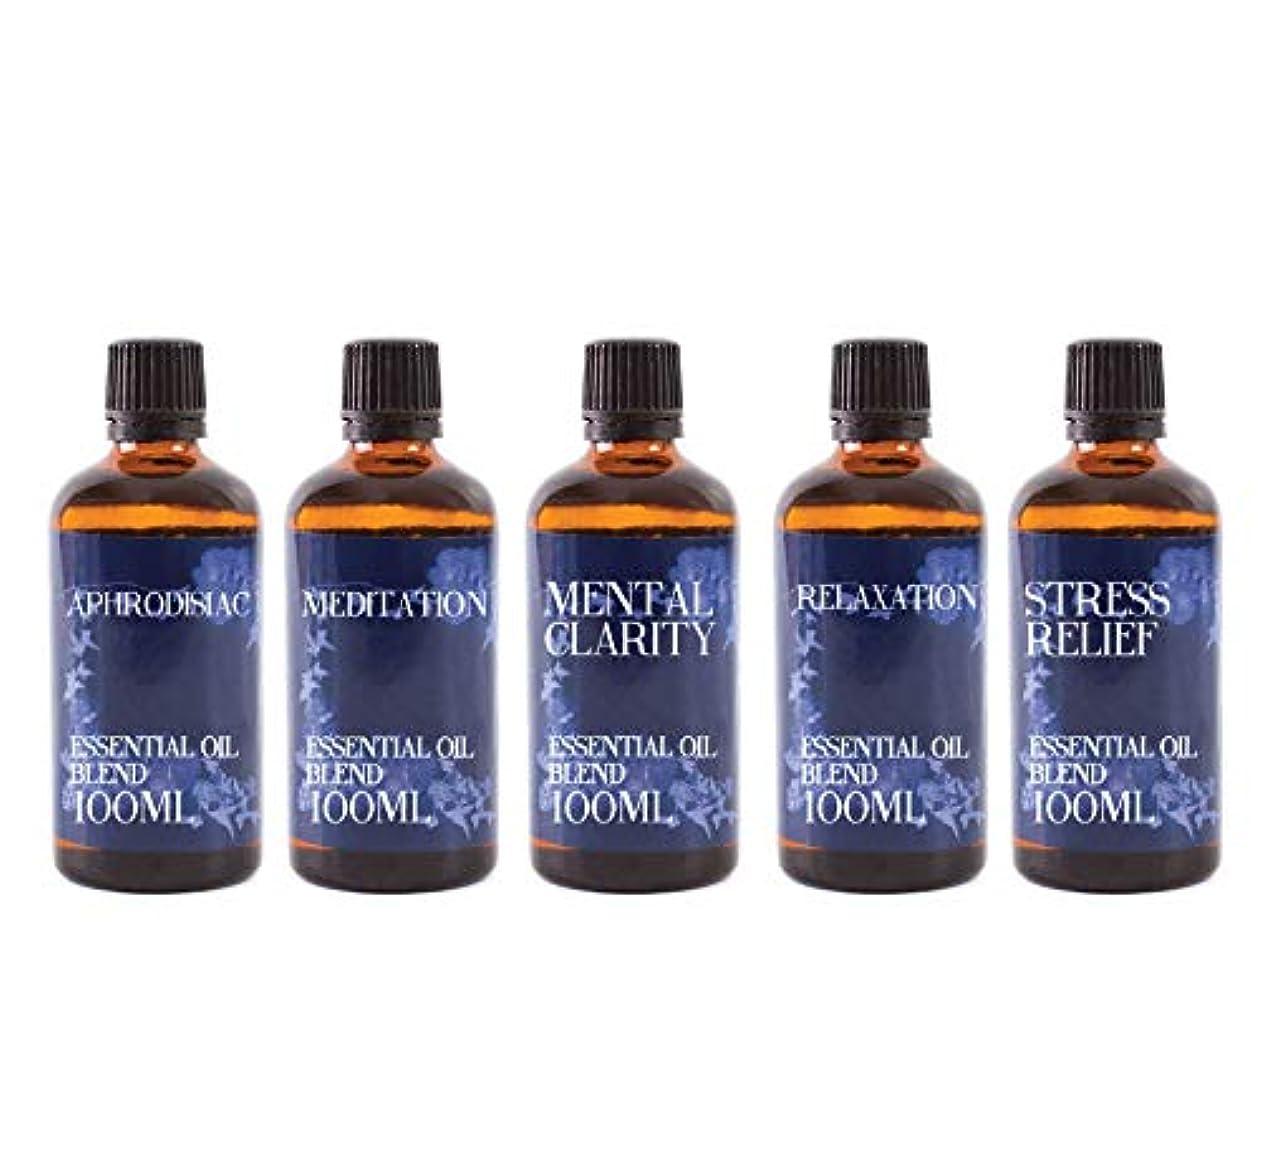 共和党王女資格Mystix London | Gift Starter Pack of 5 x 100ml - Modern Day Remedies - Essential Oil Blends